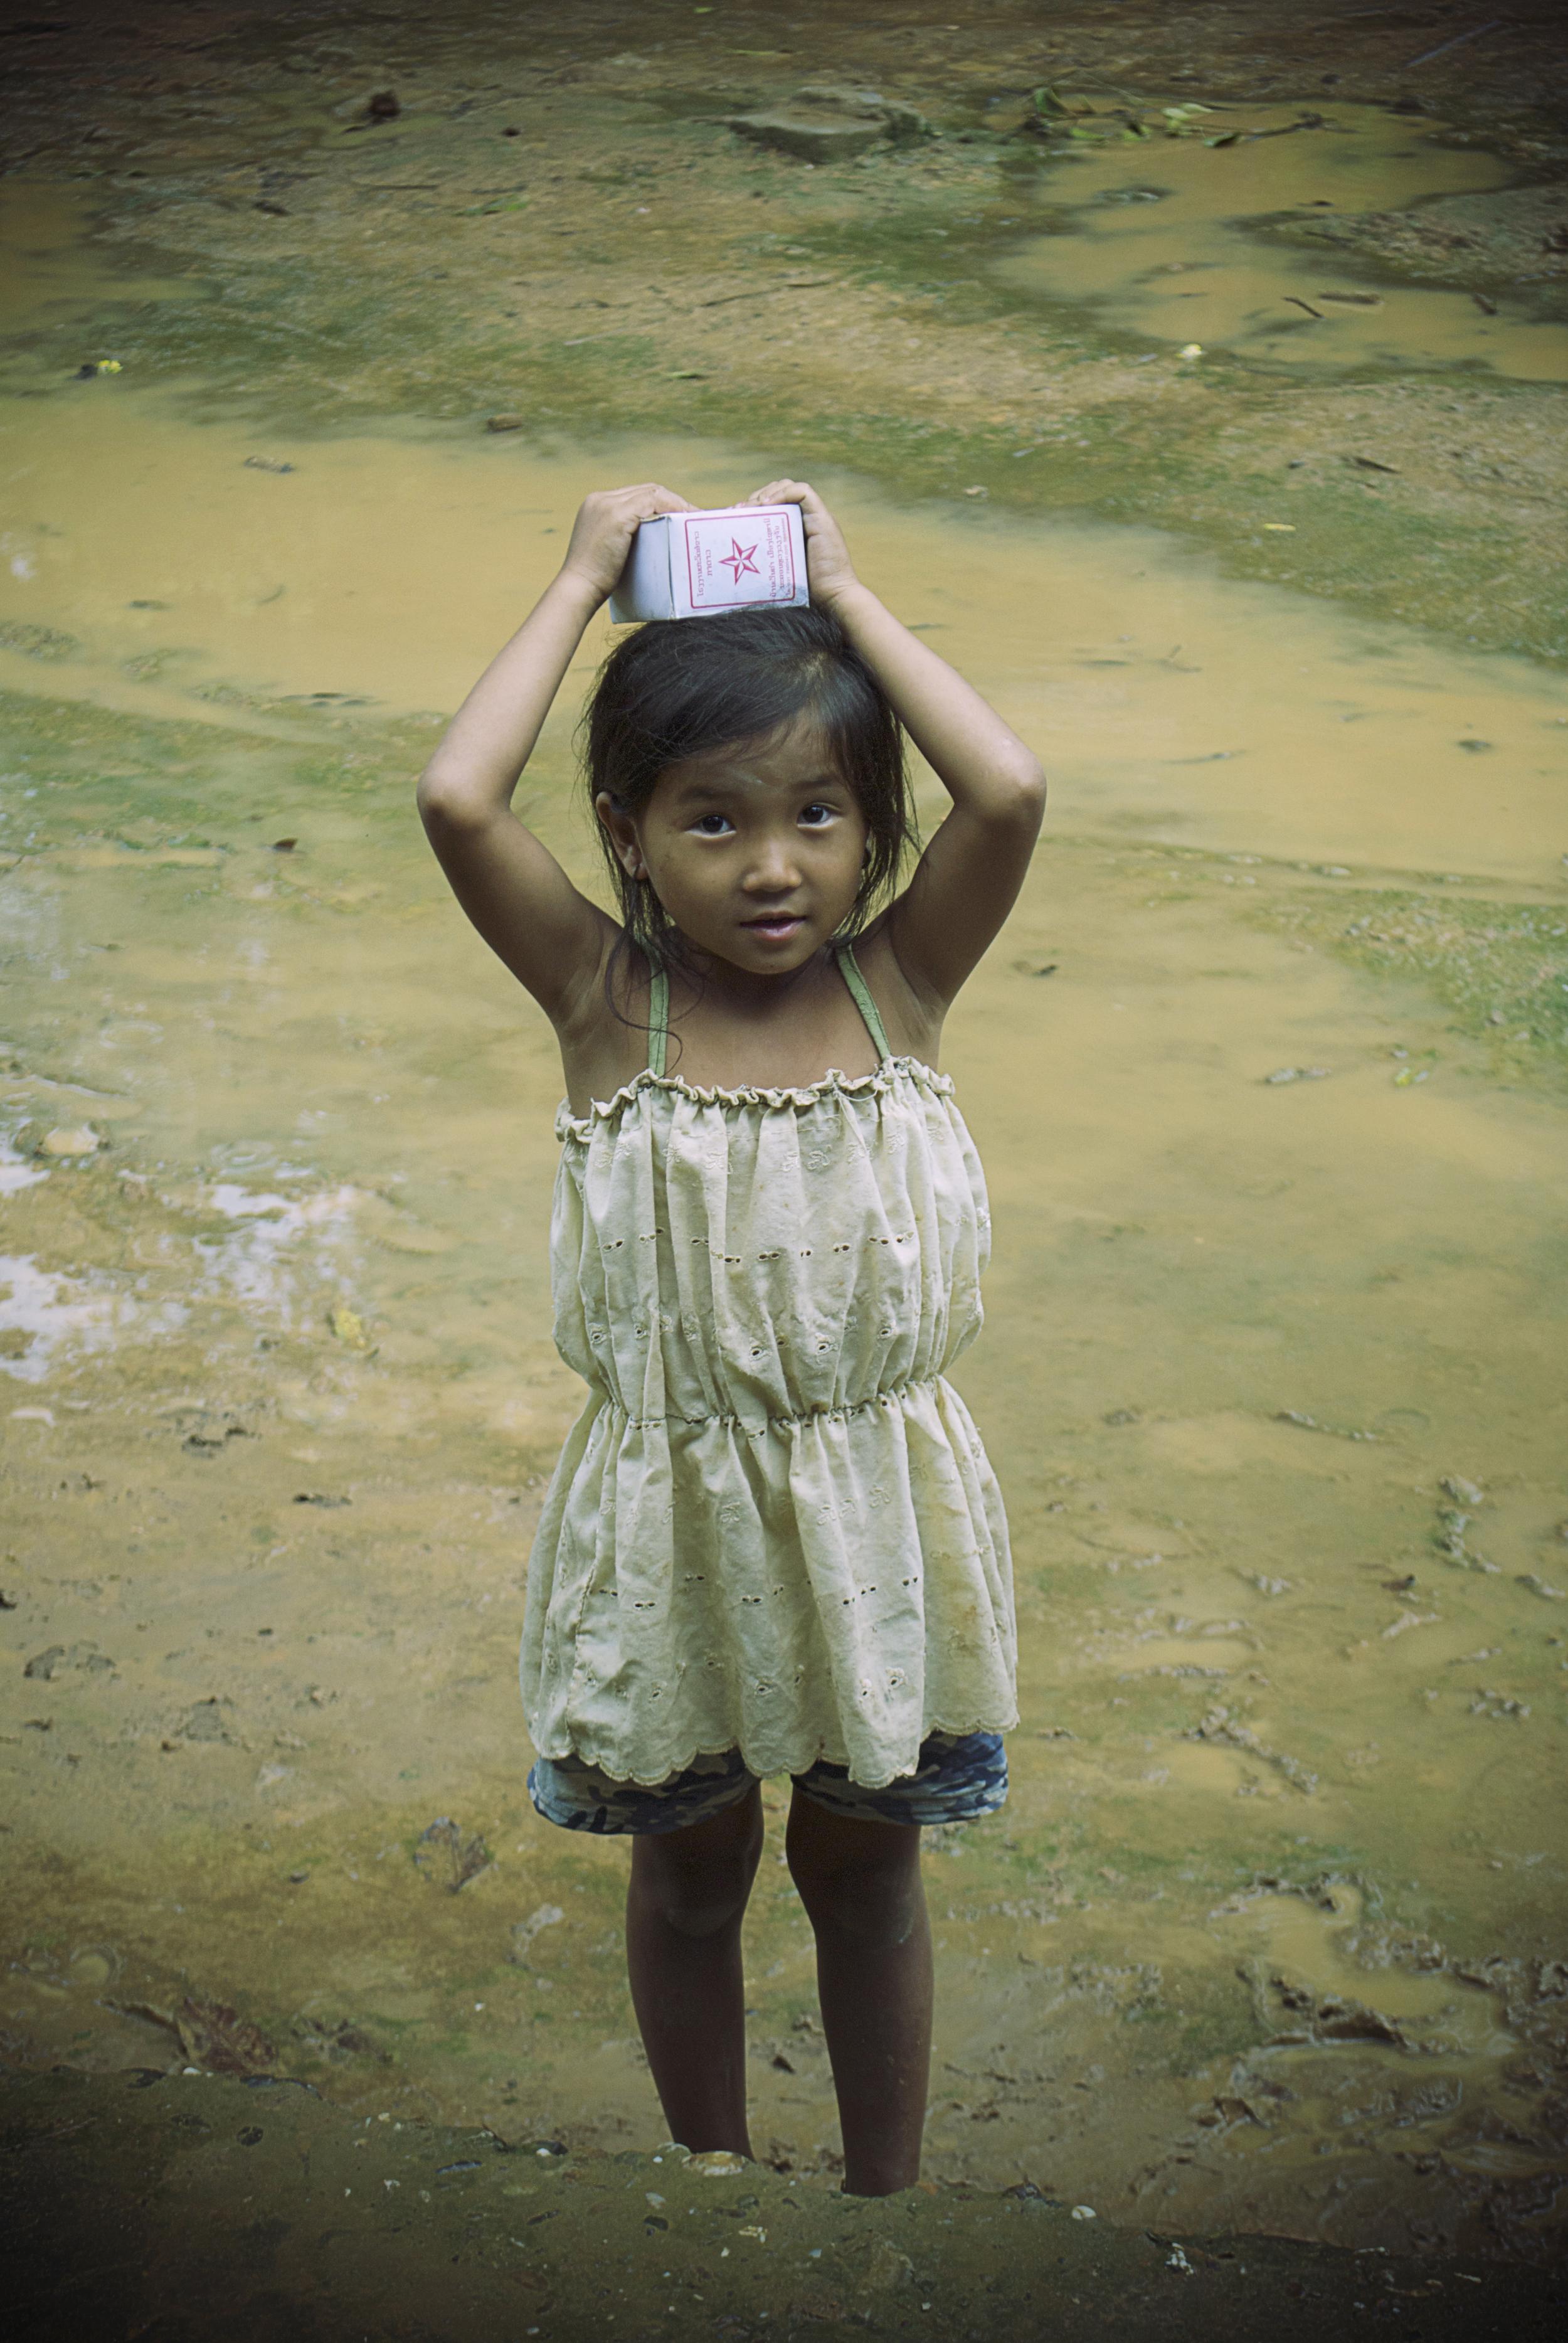 PORTRAITS | Girl in River, Ban Lad Khammoune, Laos